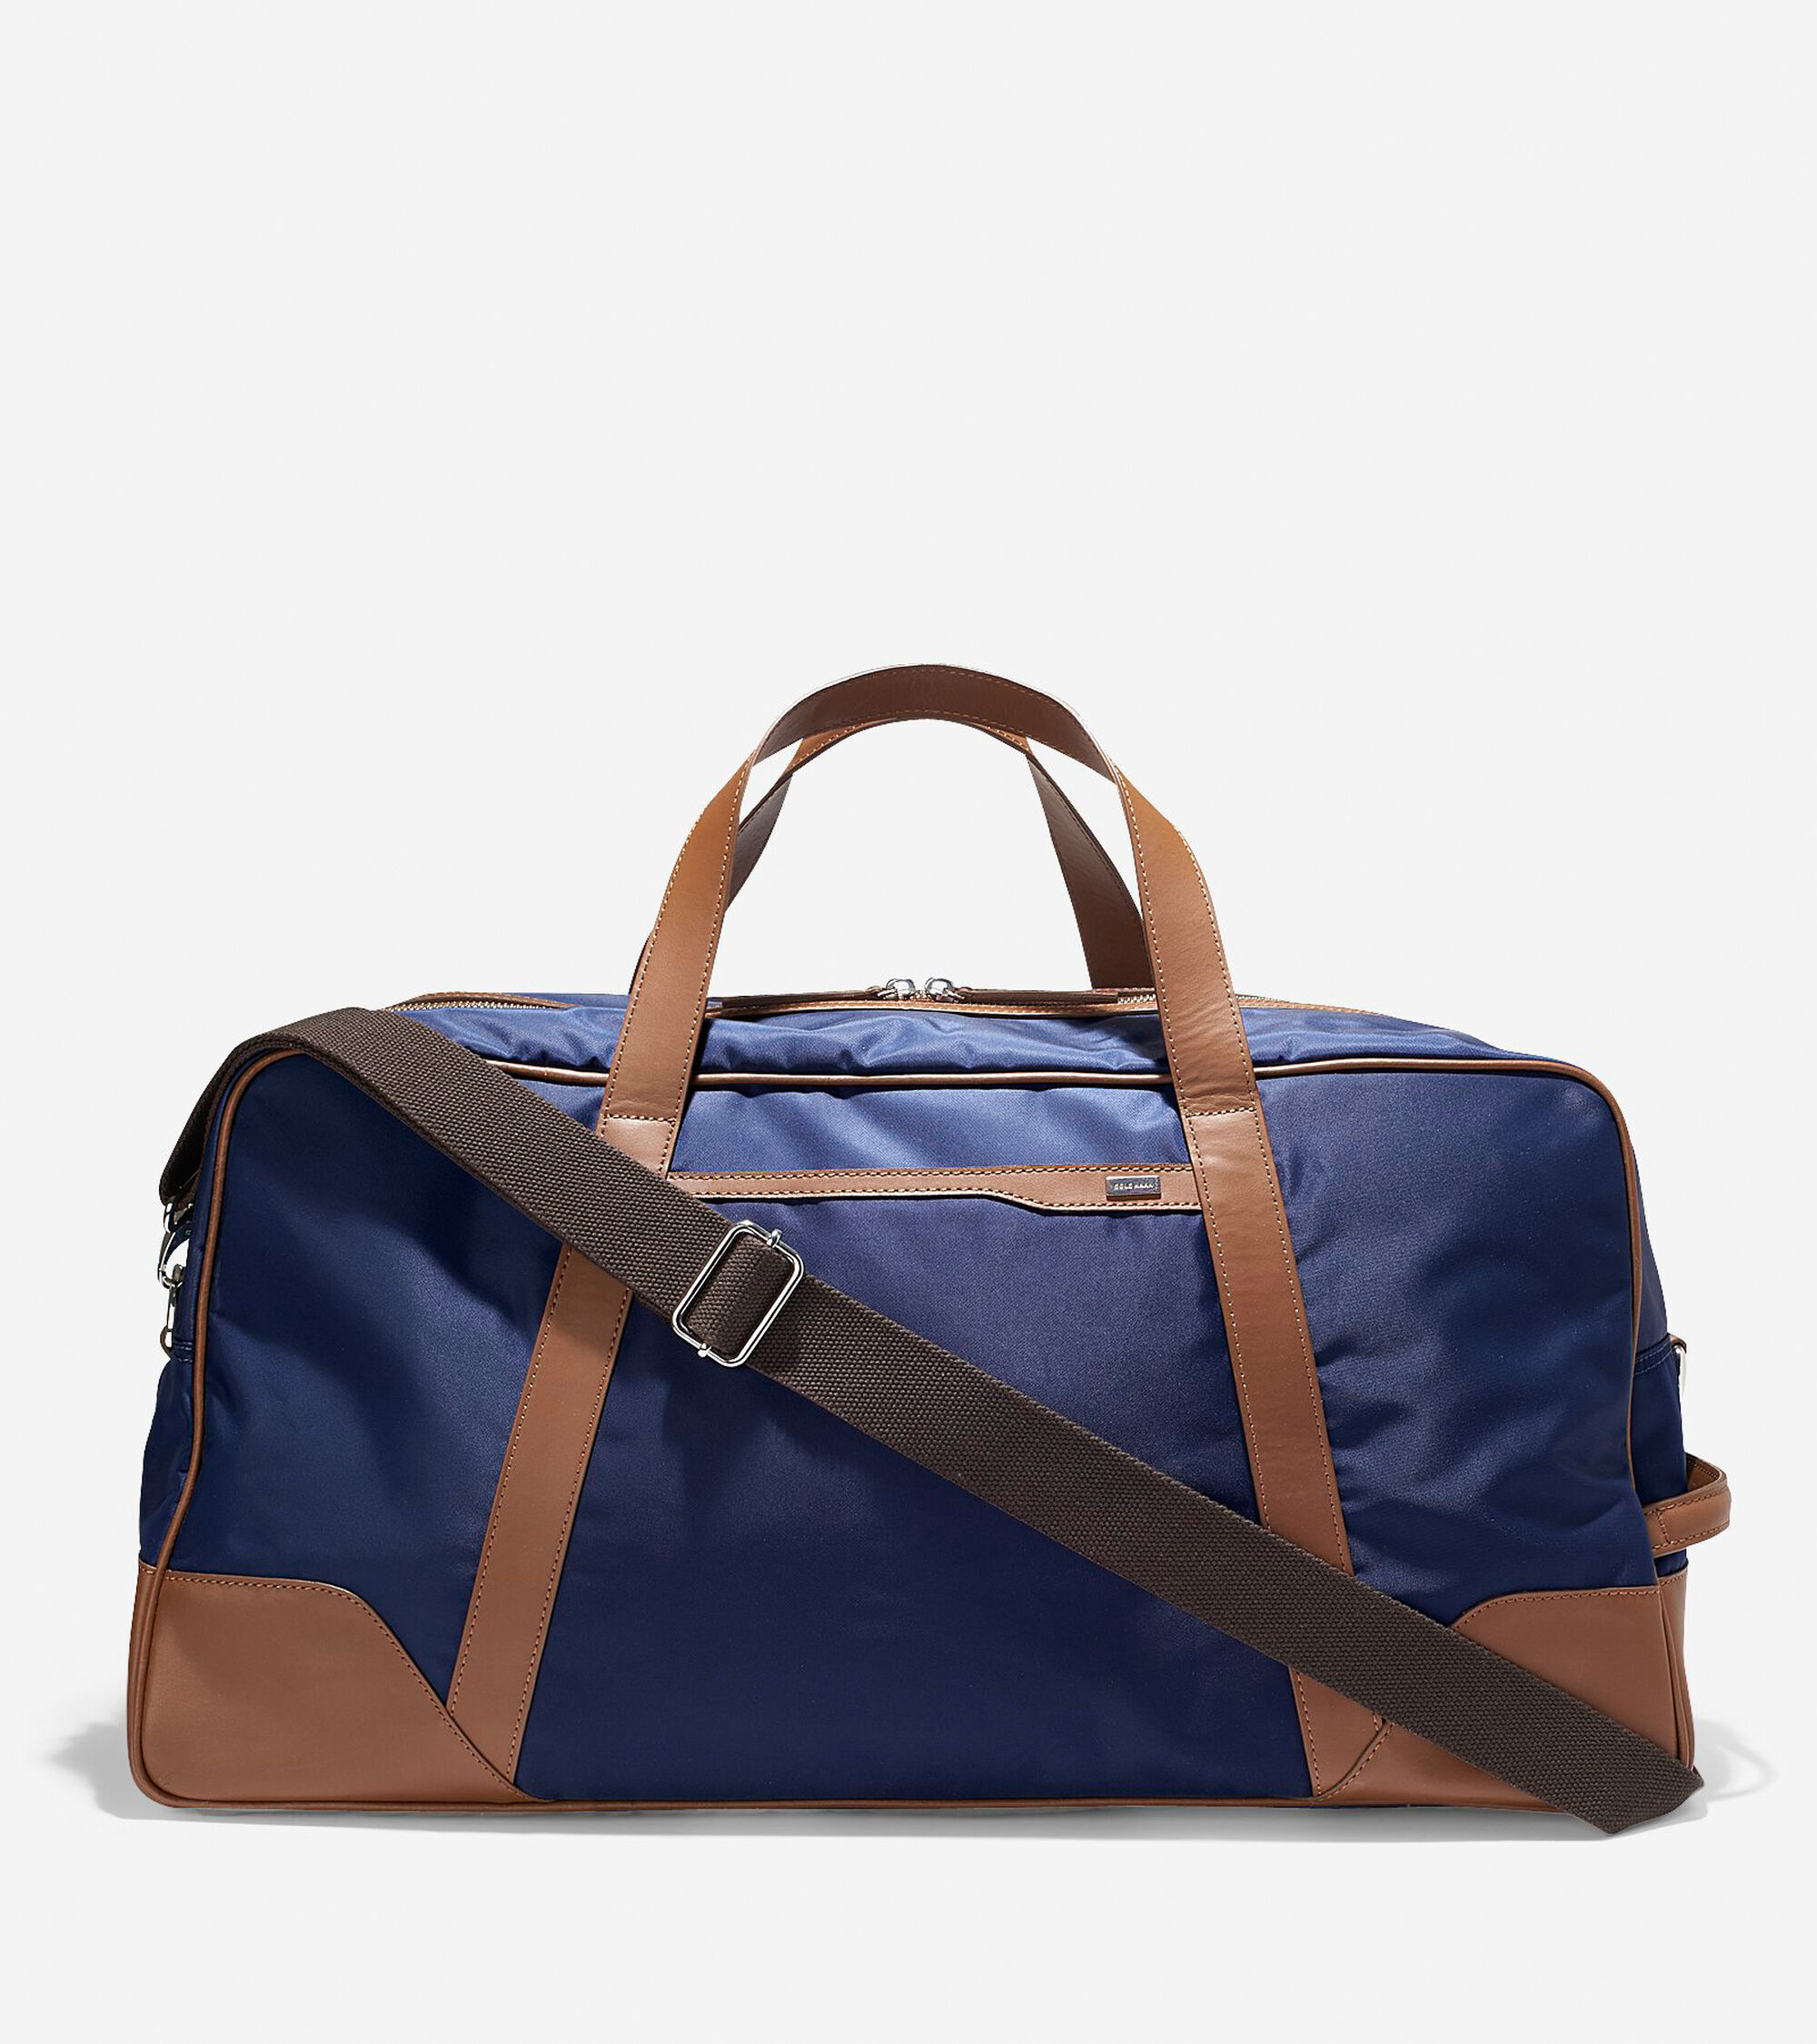 Briefs & Bags > Sullivan Duffle